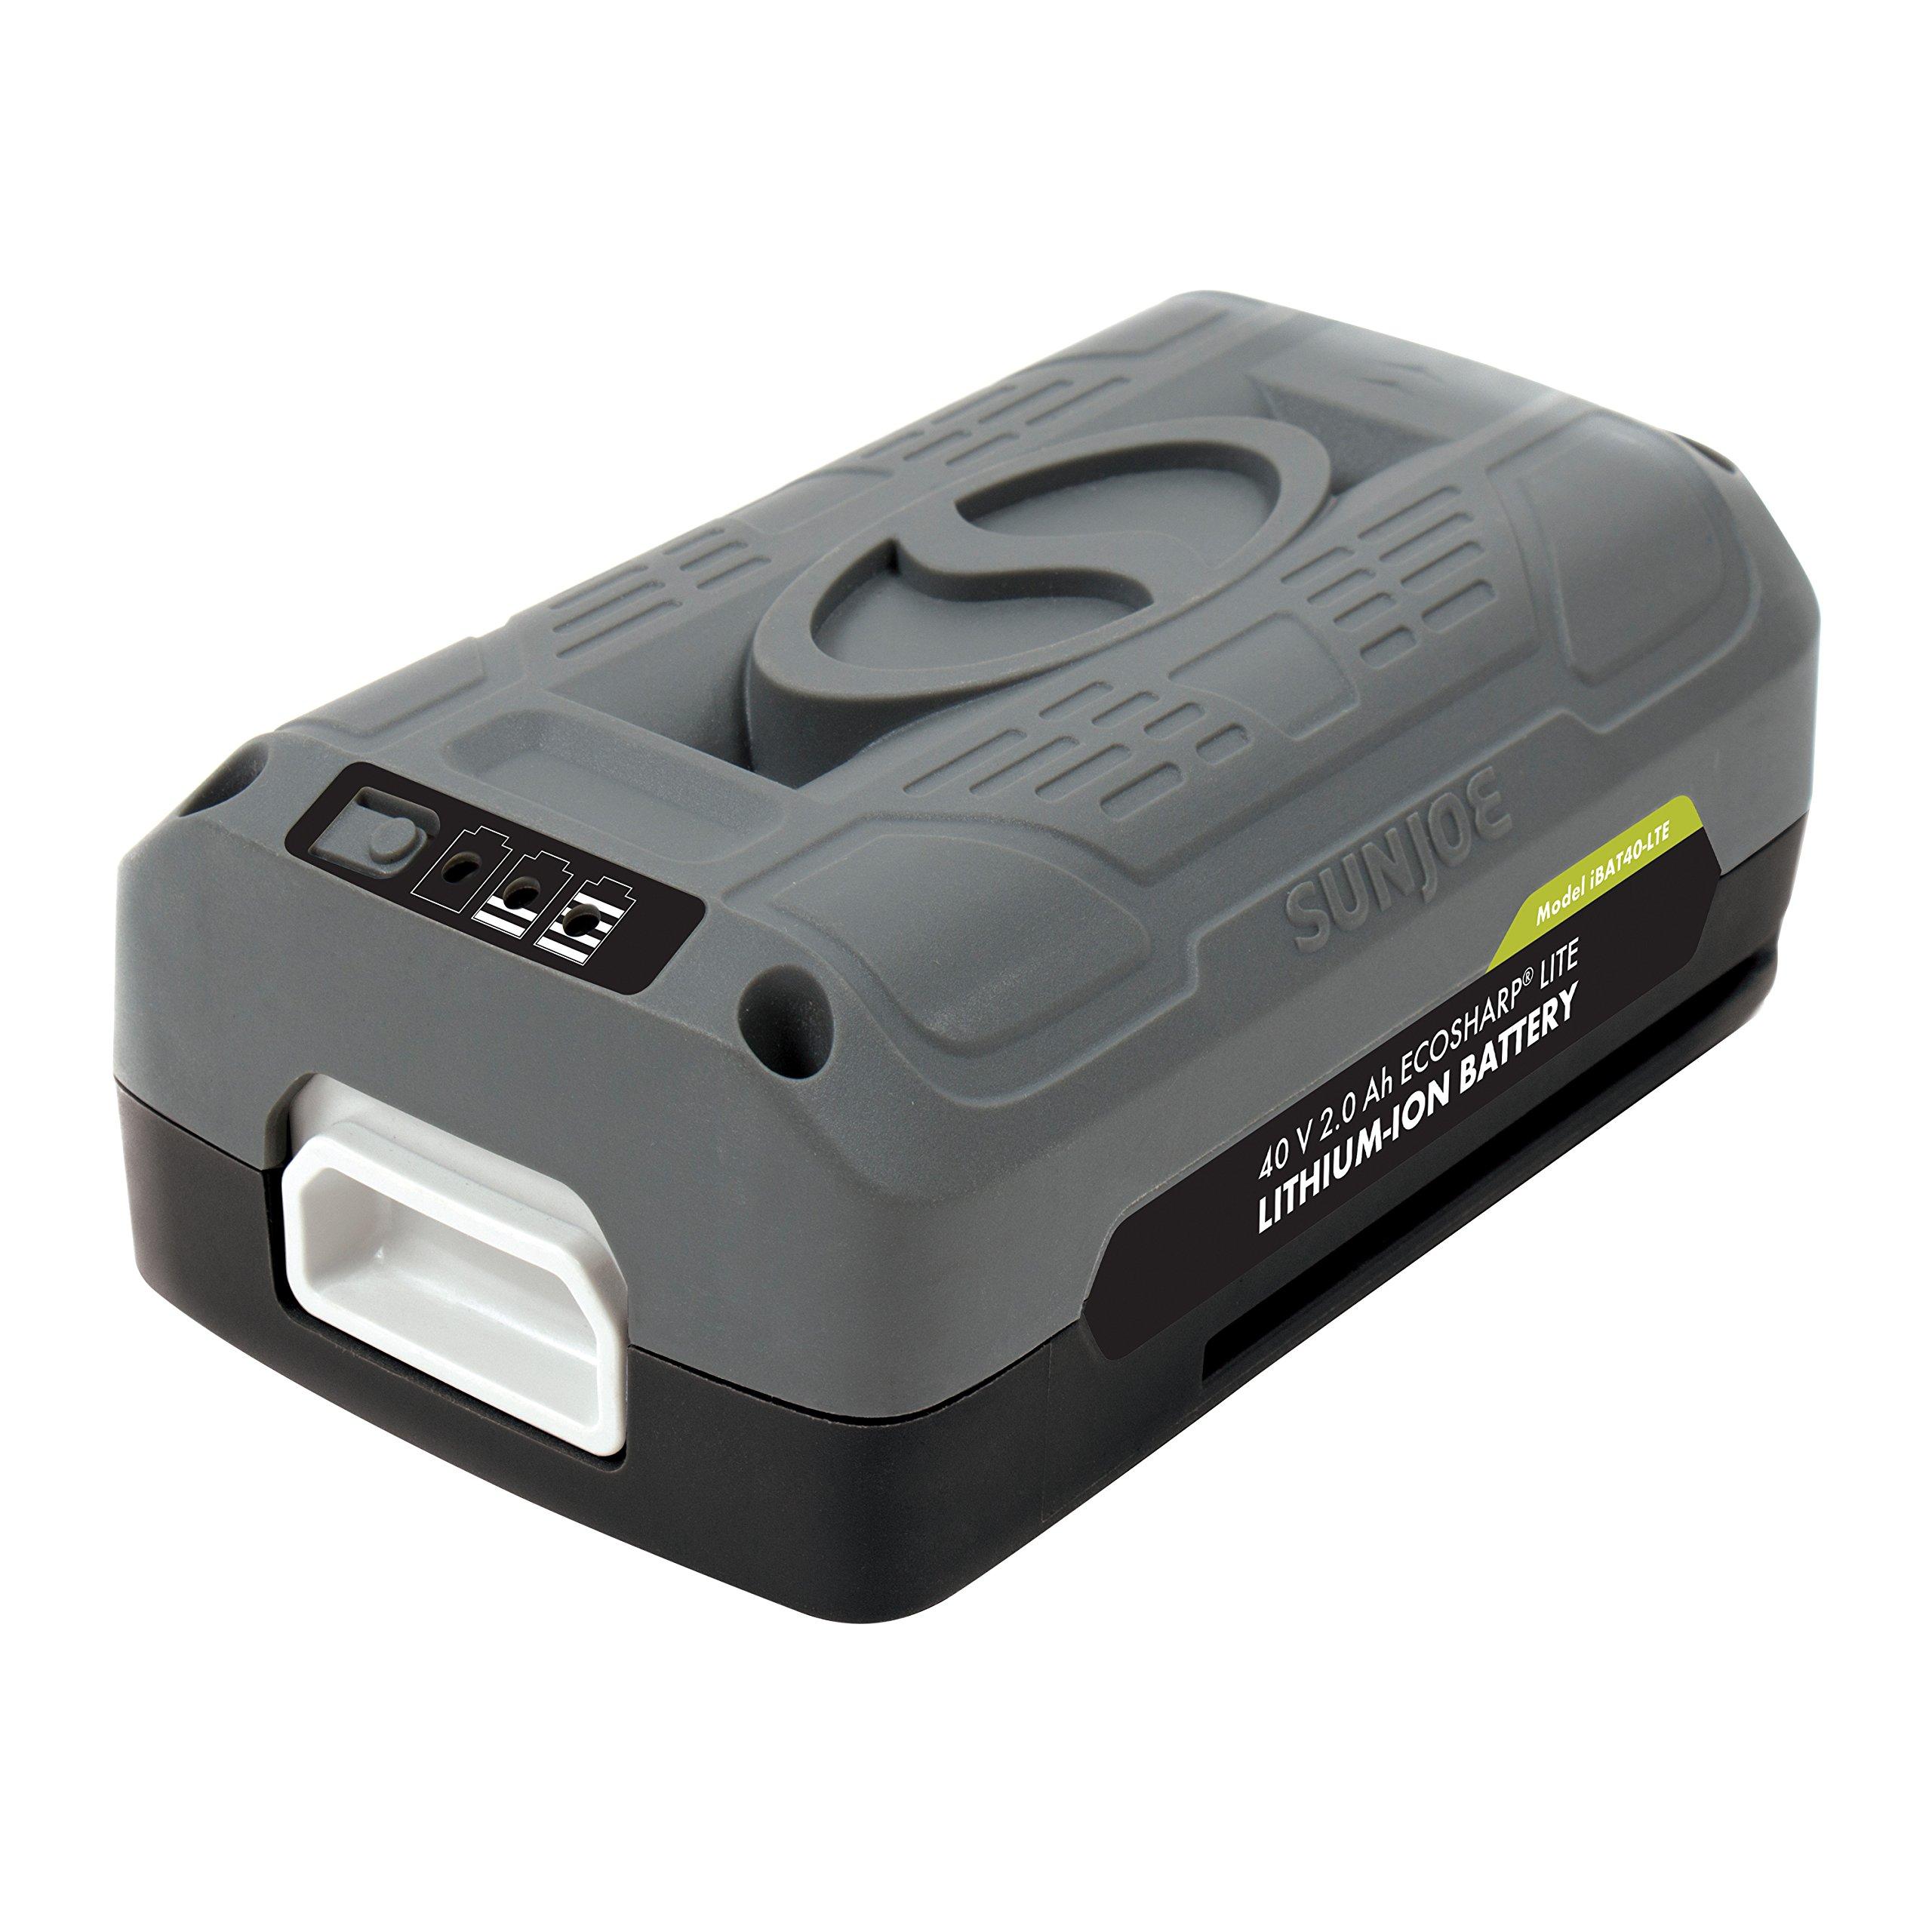 Snow Joe + Sun Joe iBAT40-LTE iON EcoSharp PRO 40 V 2.0 Ah Lithium-Ion Battery